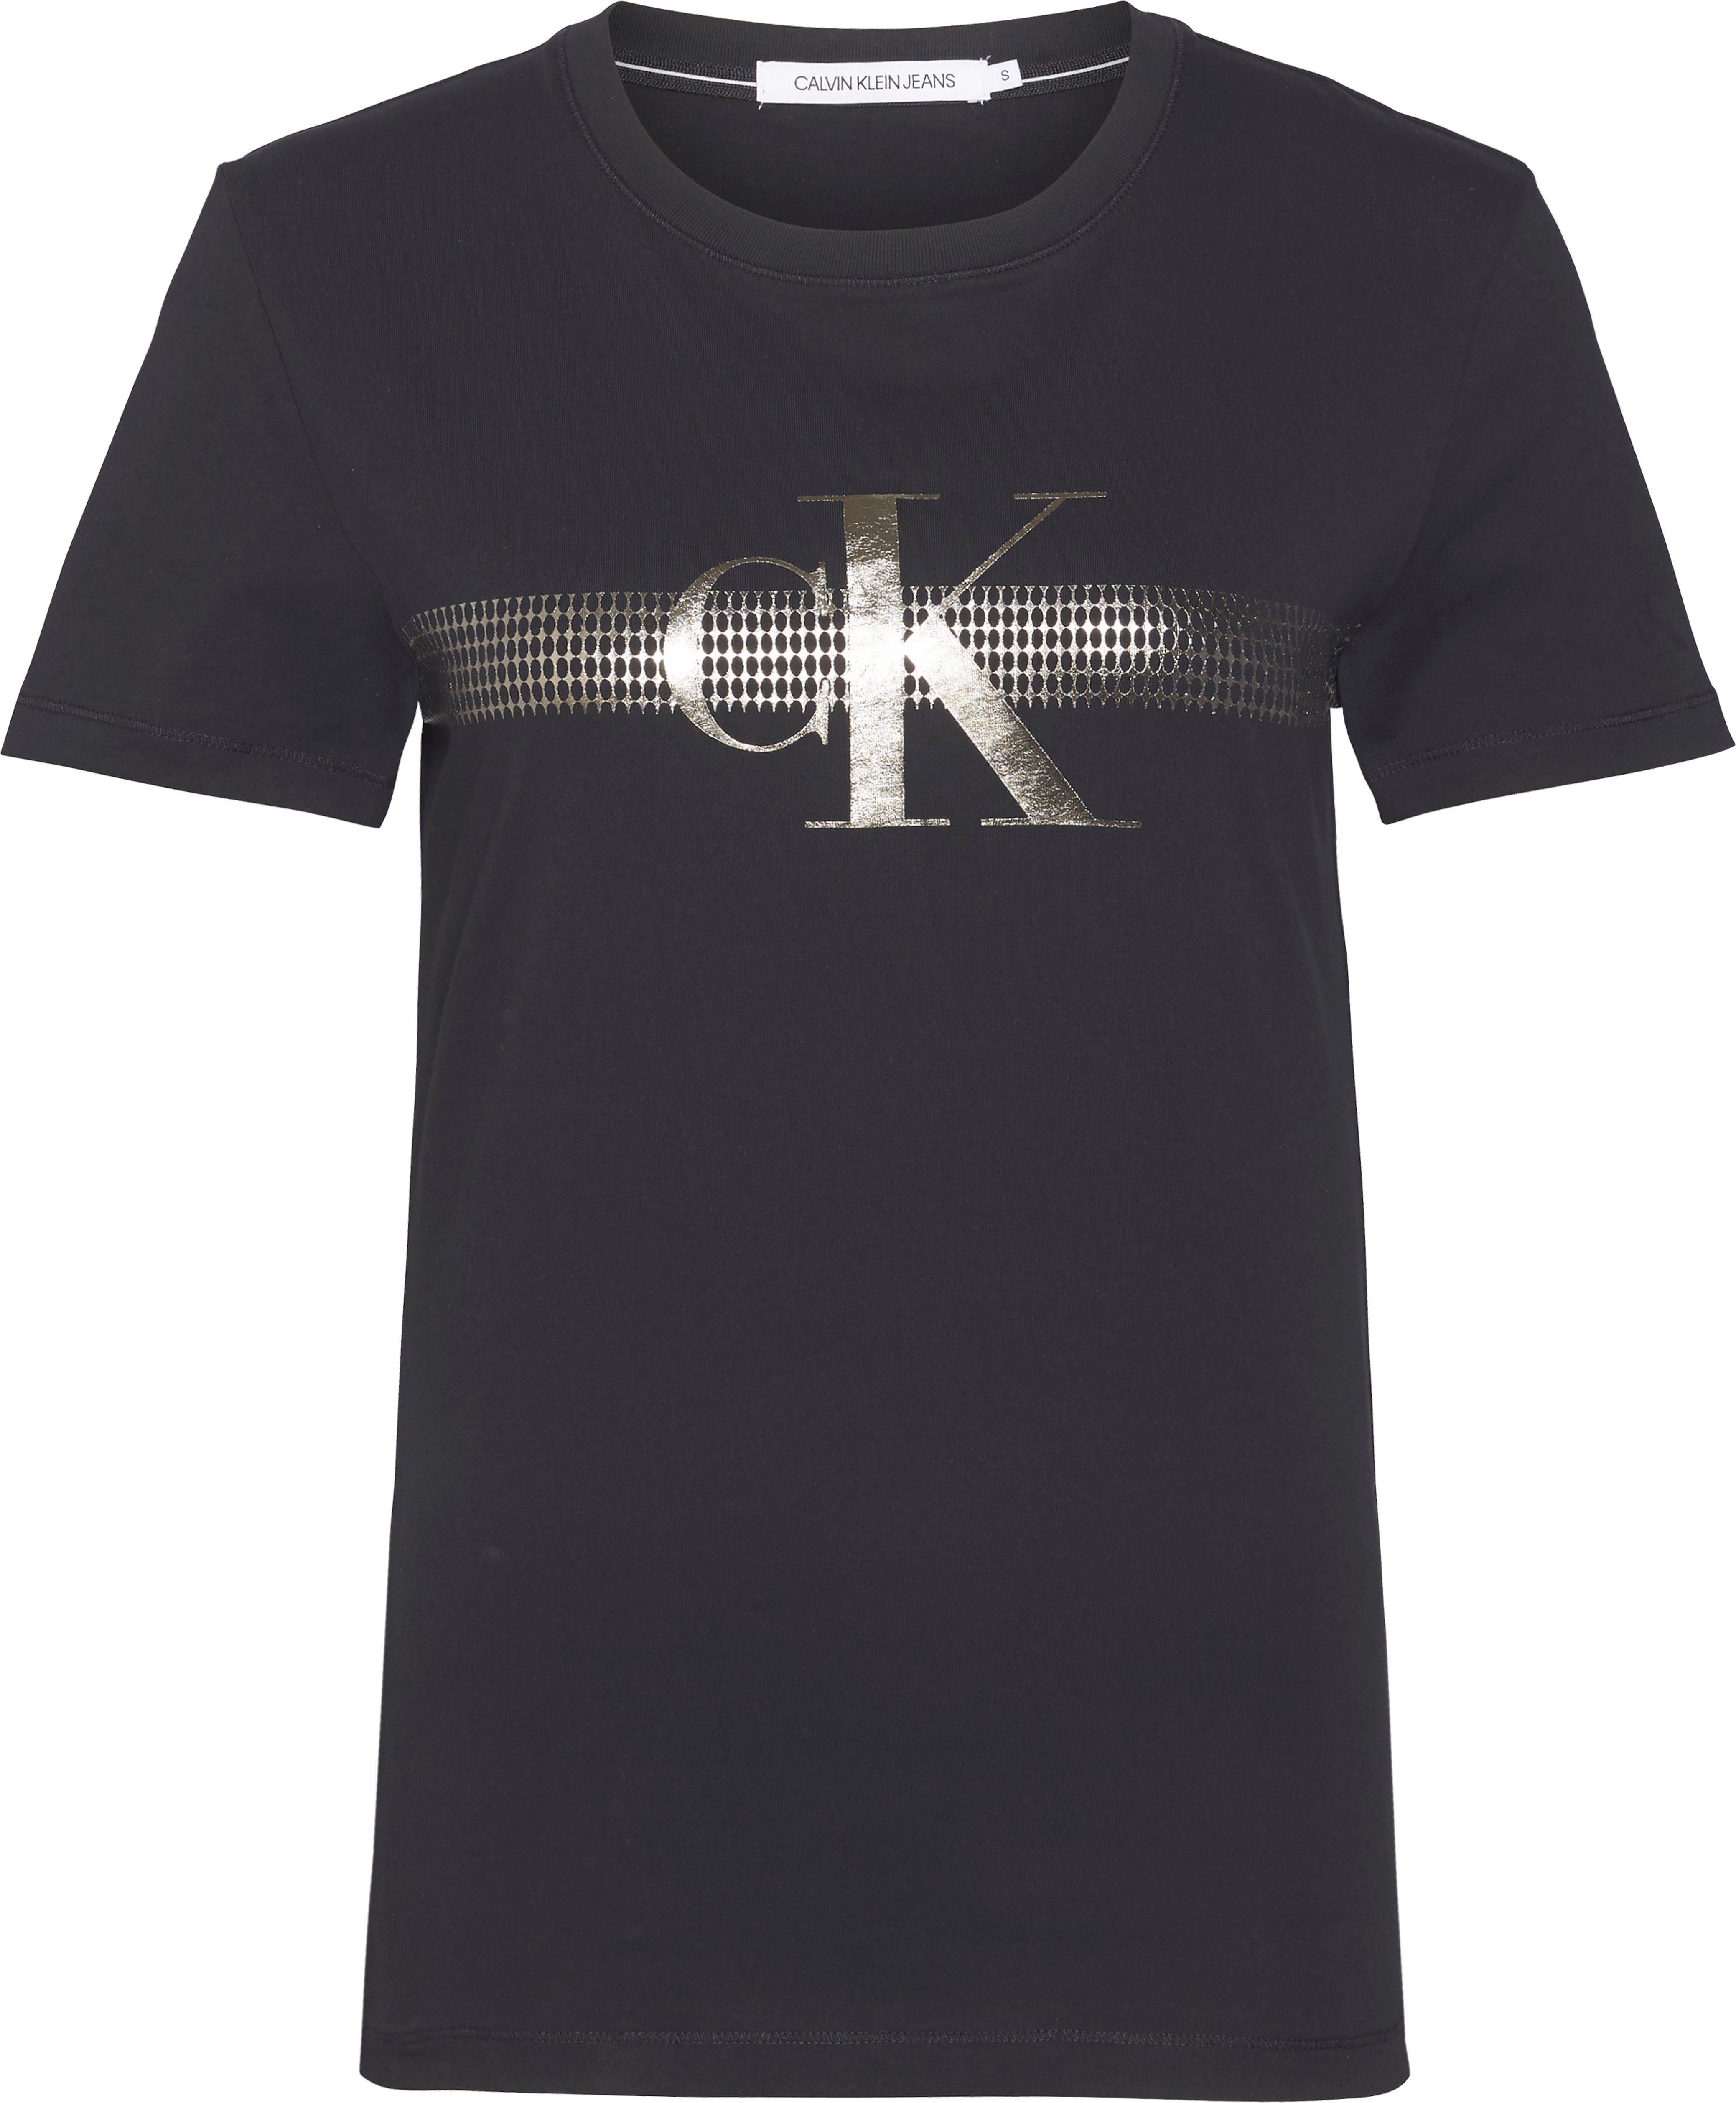 Mens Womens  3D Print  Spiderman  Funny Casual T Shirt  Short Top Tee E171